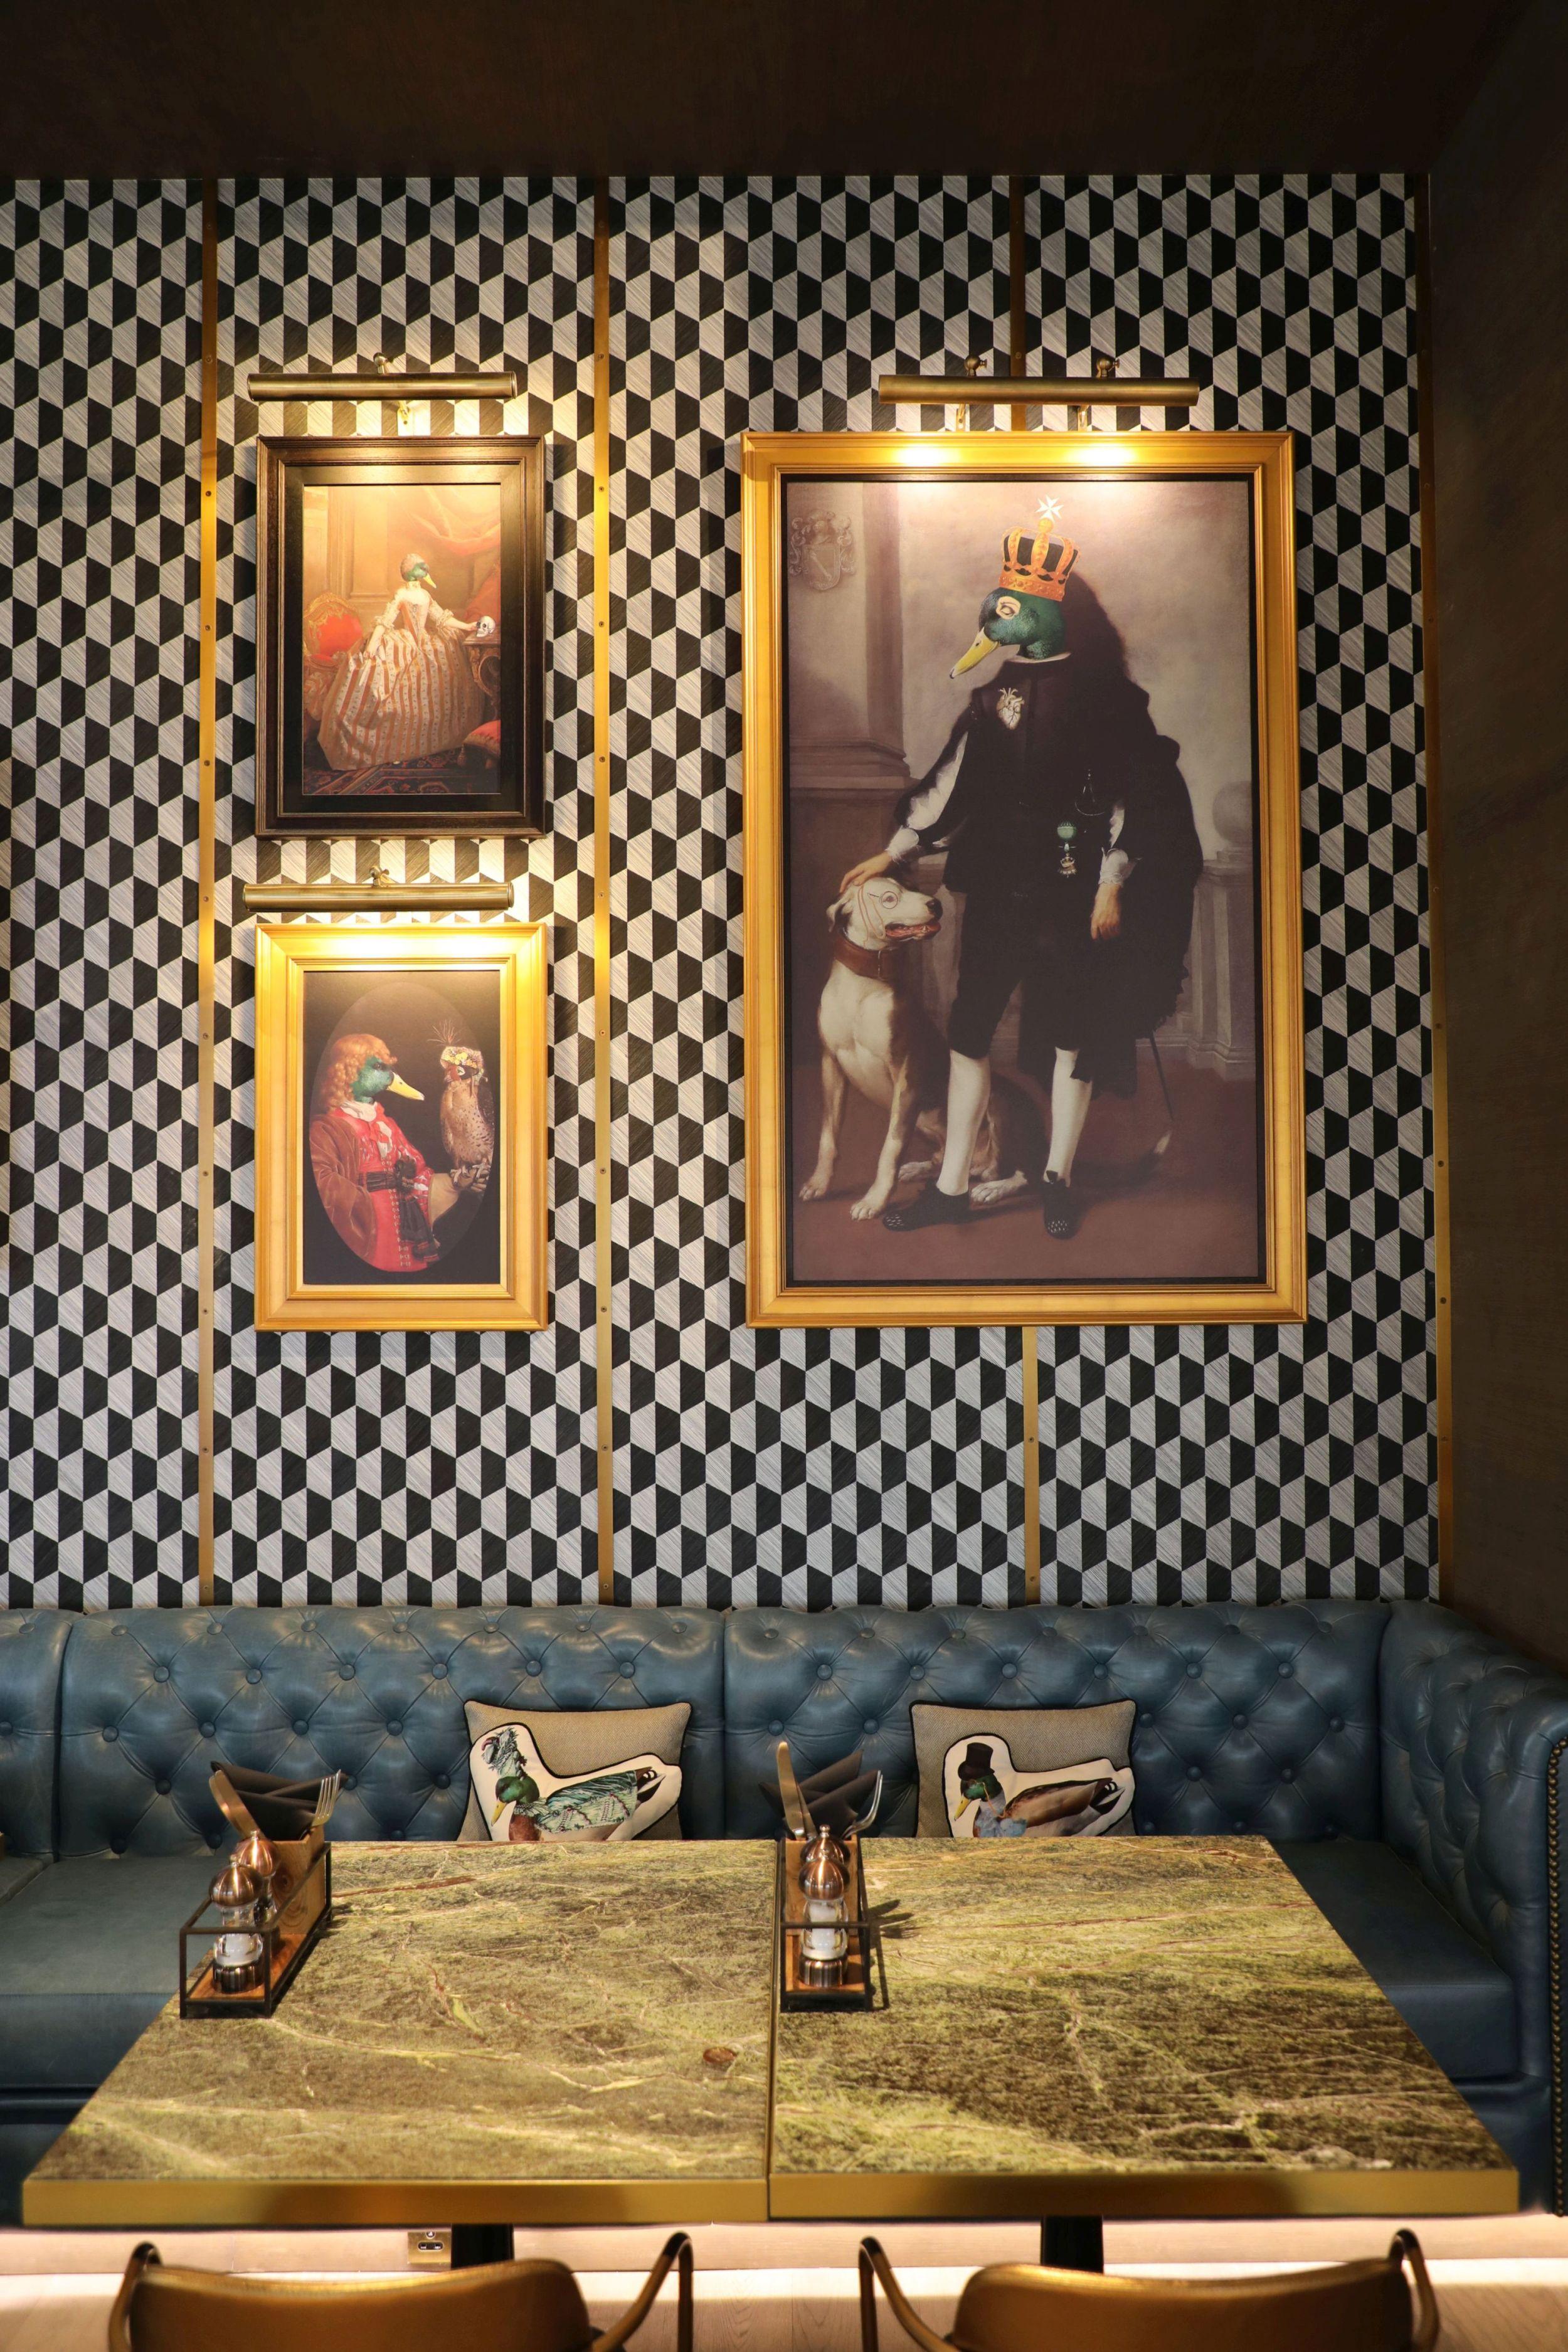 مطعم ذا داك هوك في نادي دبي هيلز للغولف